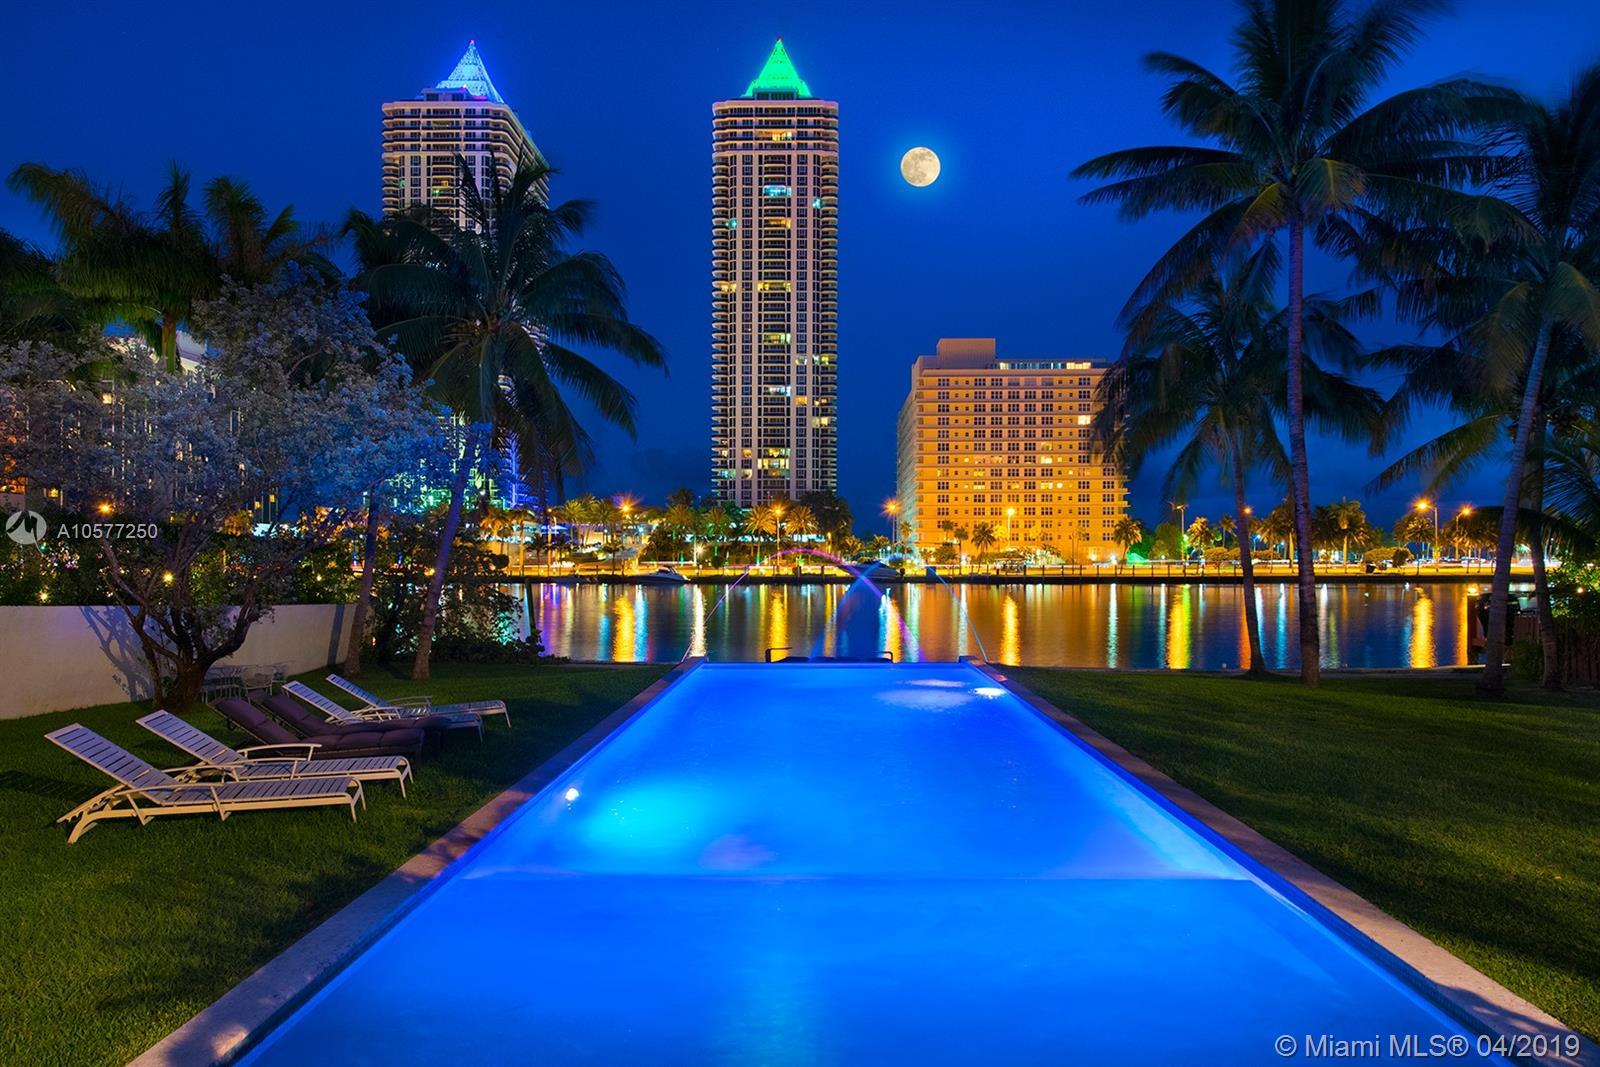 4745 Pine Tree Dr, Miami Beach, FL 33140